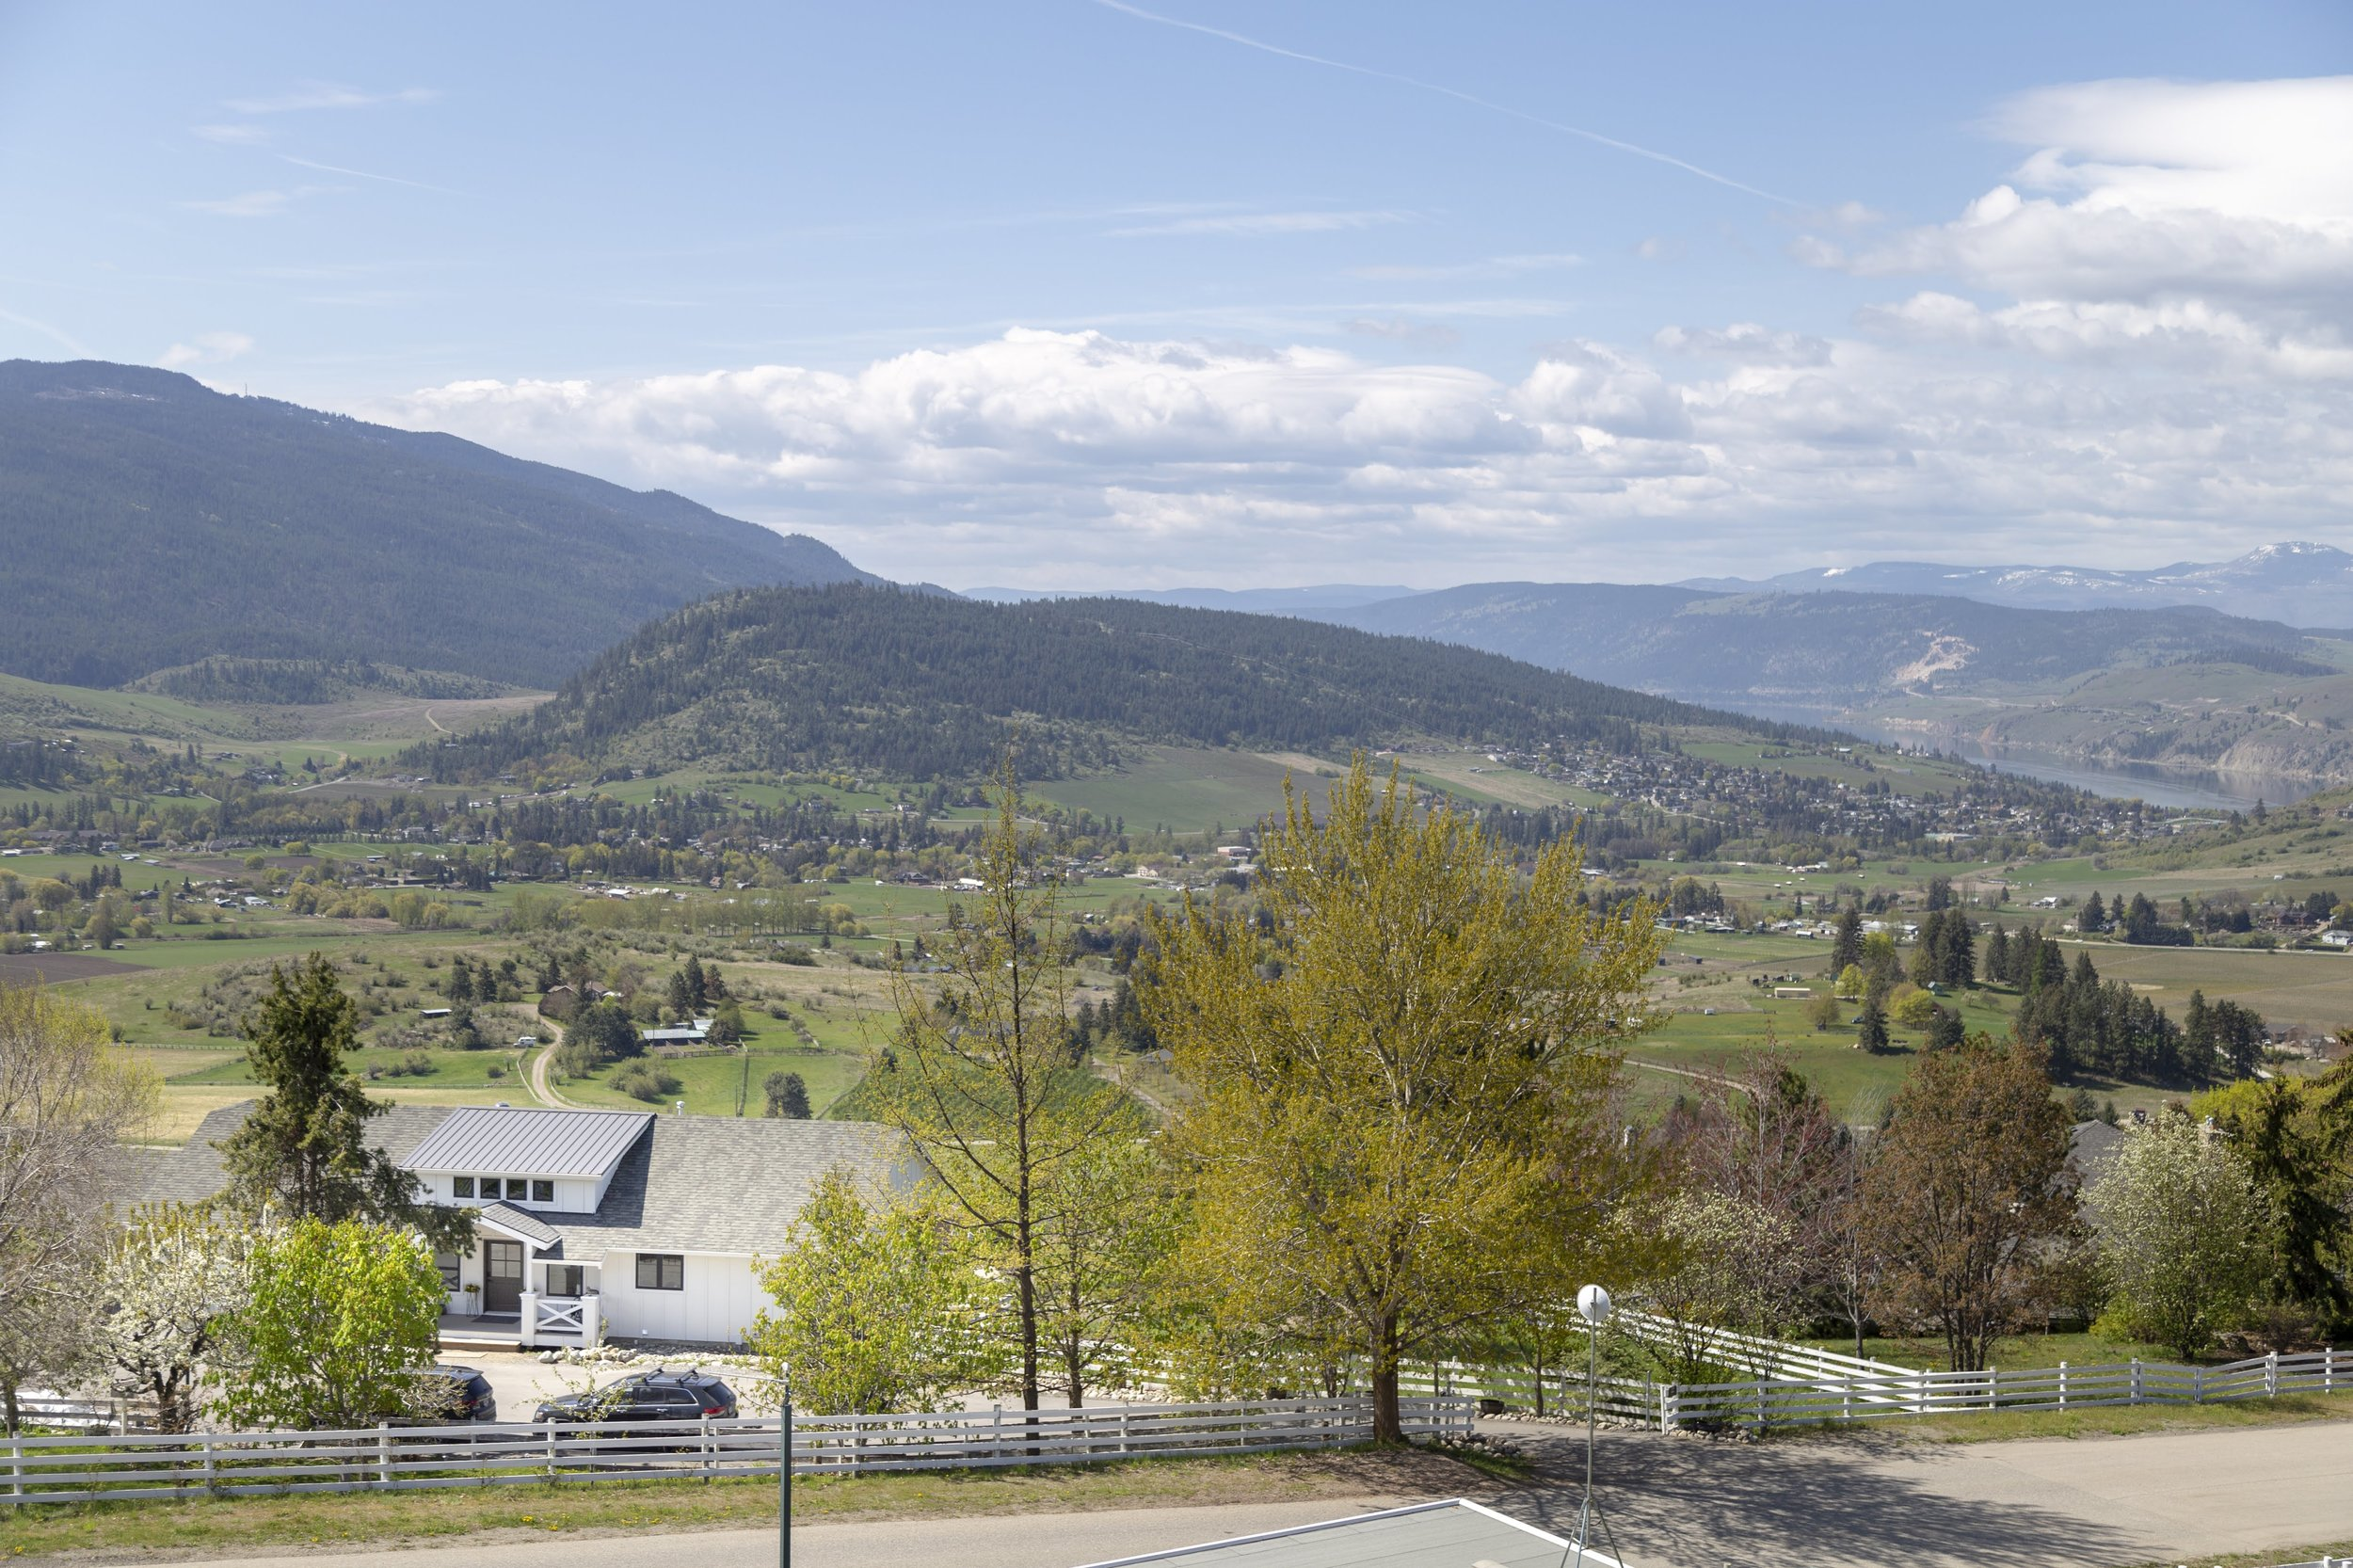 Views of the Okanagan Valley, Kalamalka and Okanagan Lake